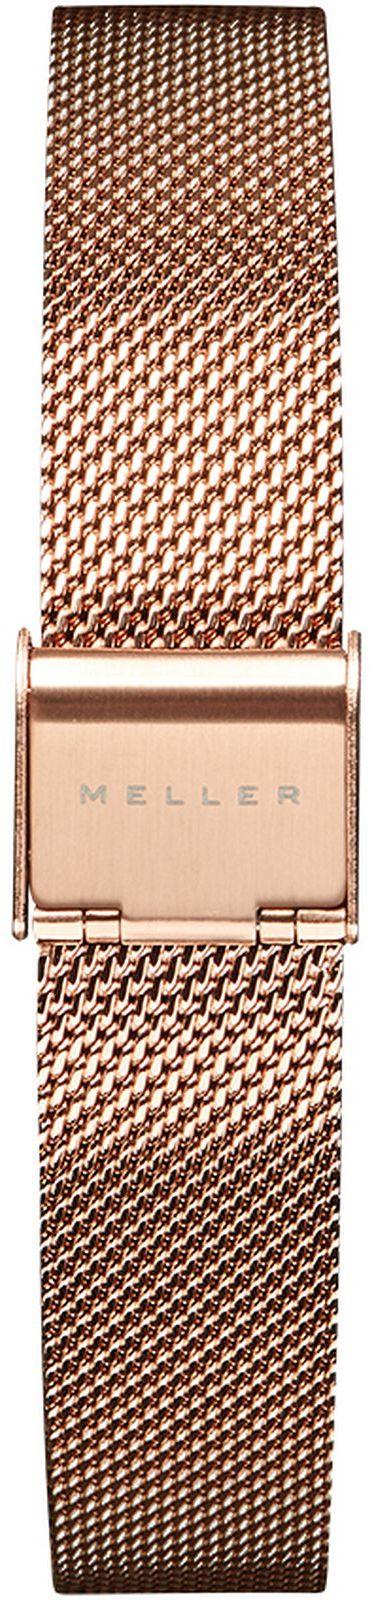 Bransoleta Meller Roos Gold Metal 16 mm